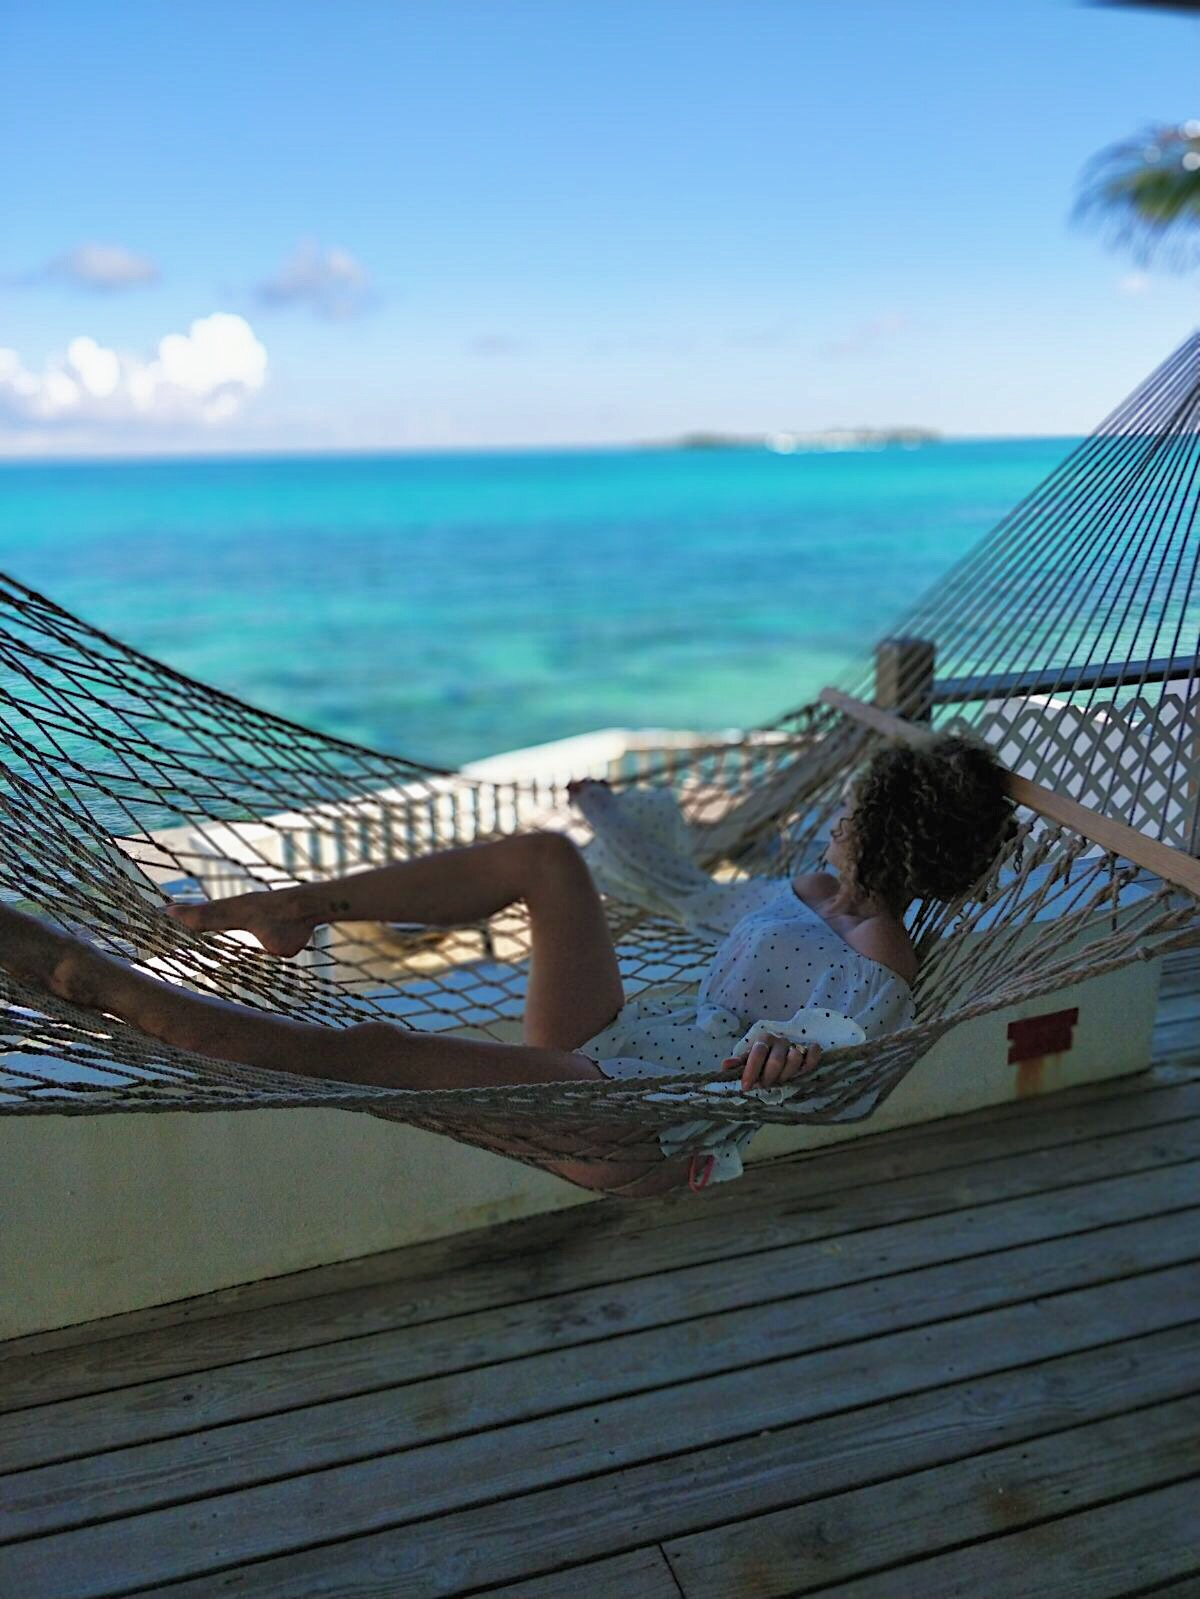 bahamas-voyage-séjour-rêve-eau-nassau-sandyport-airbnb-lestendancesdelilou-boris deltell-sorryformyfrench-magazine-monsieurmada.me-travel-vacances-caraibes-globe trotter-paradise-island-île